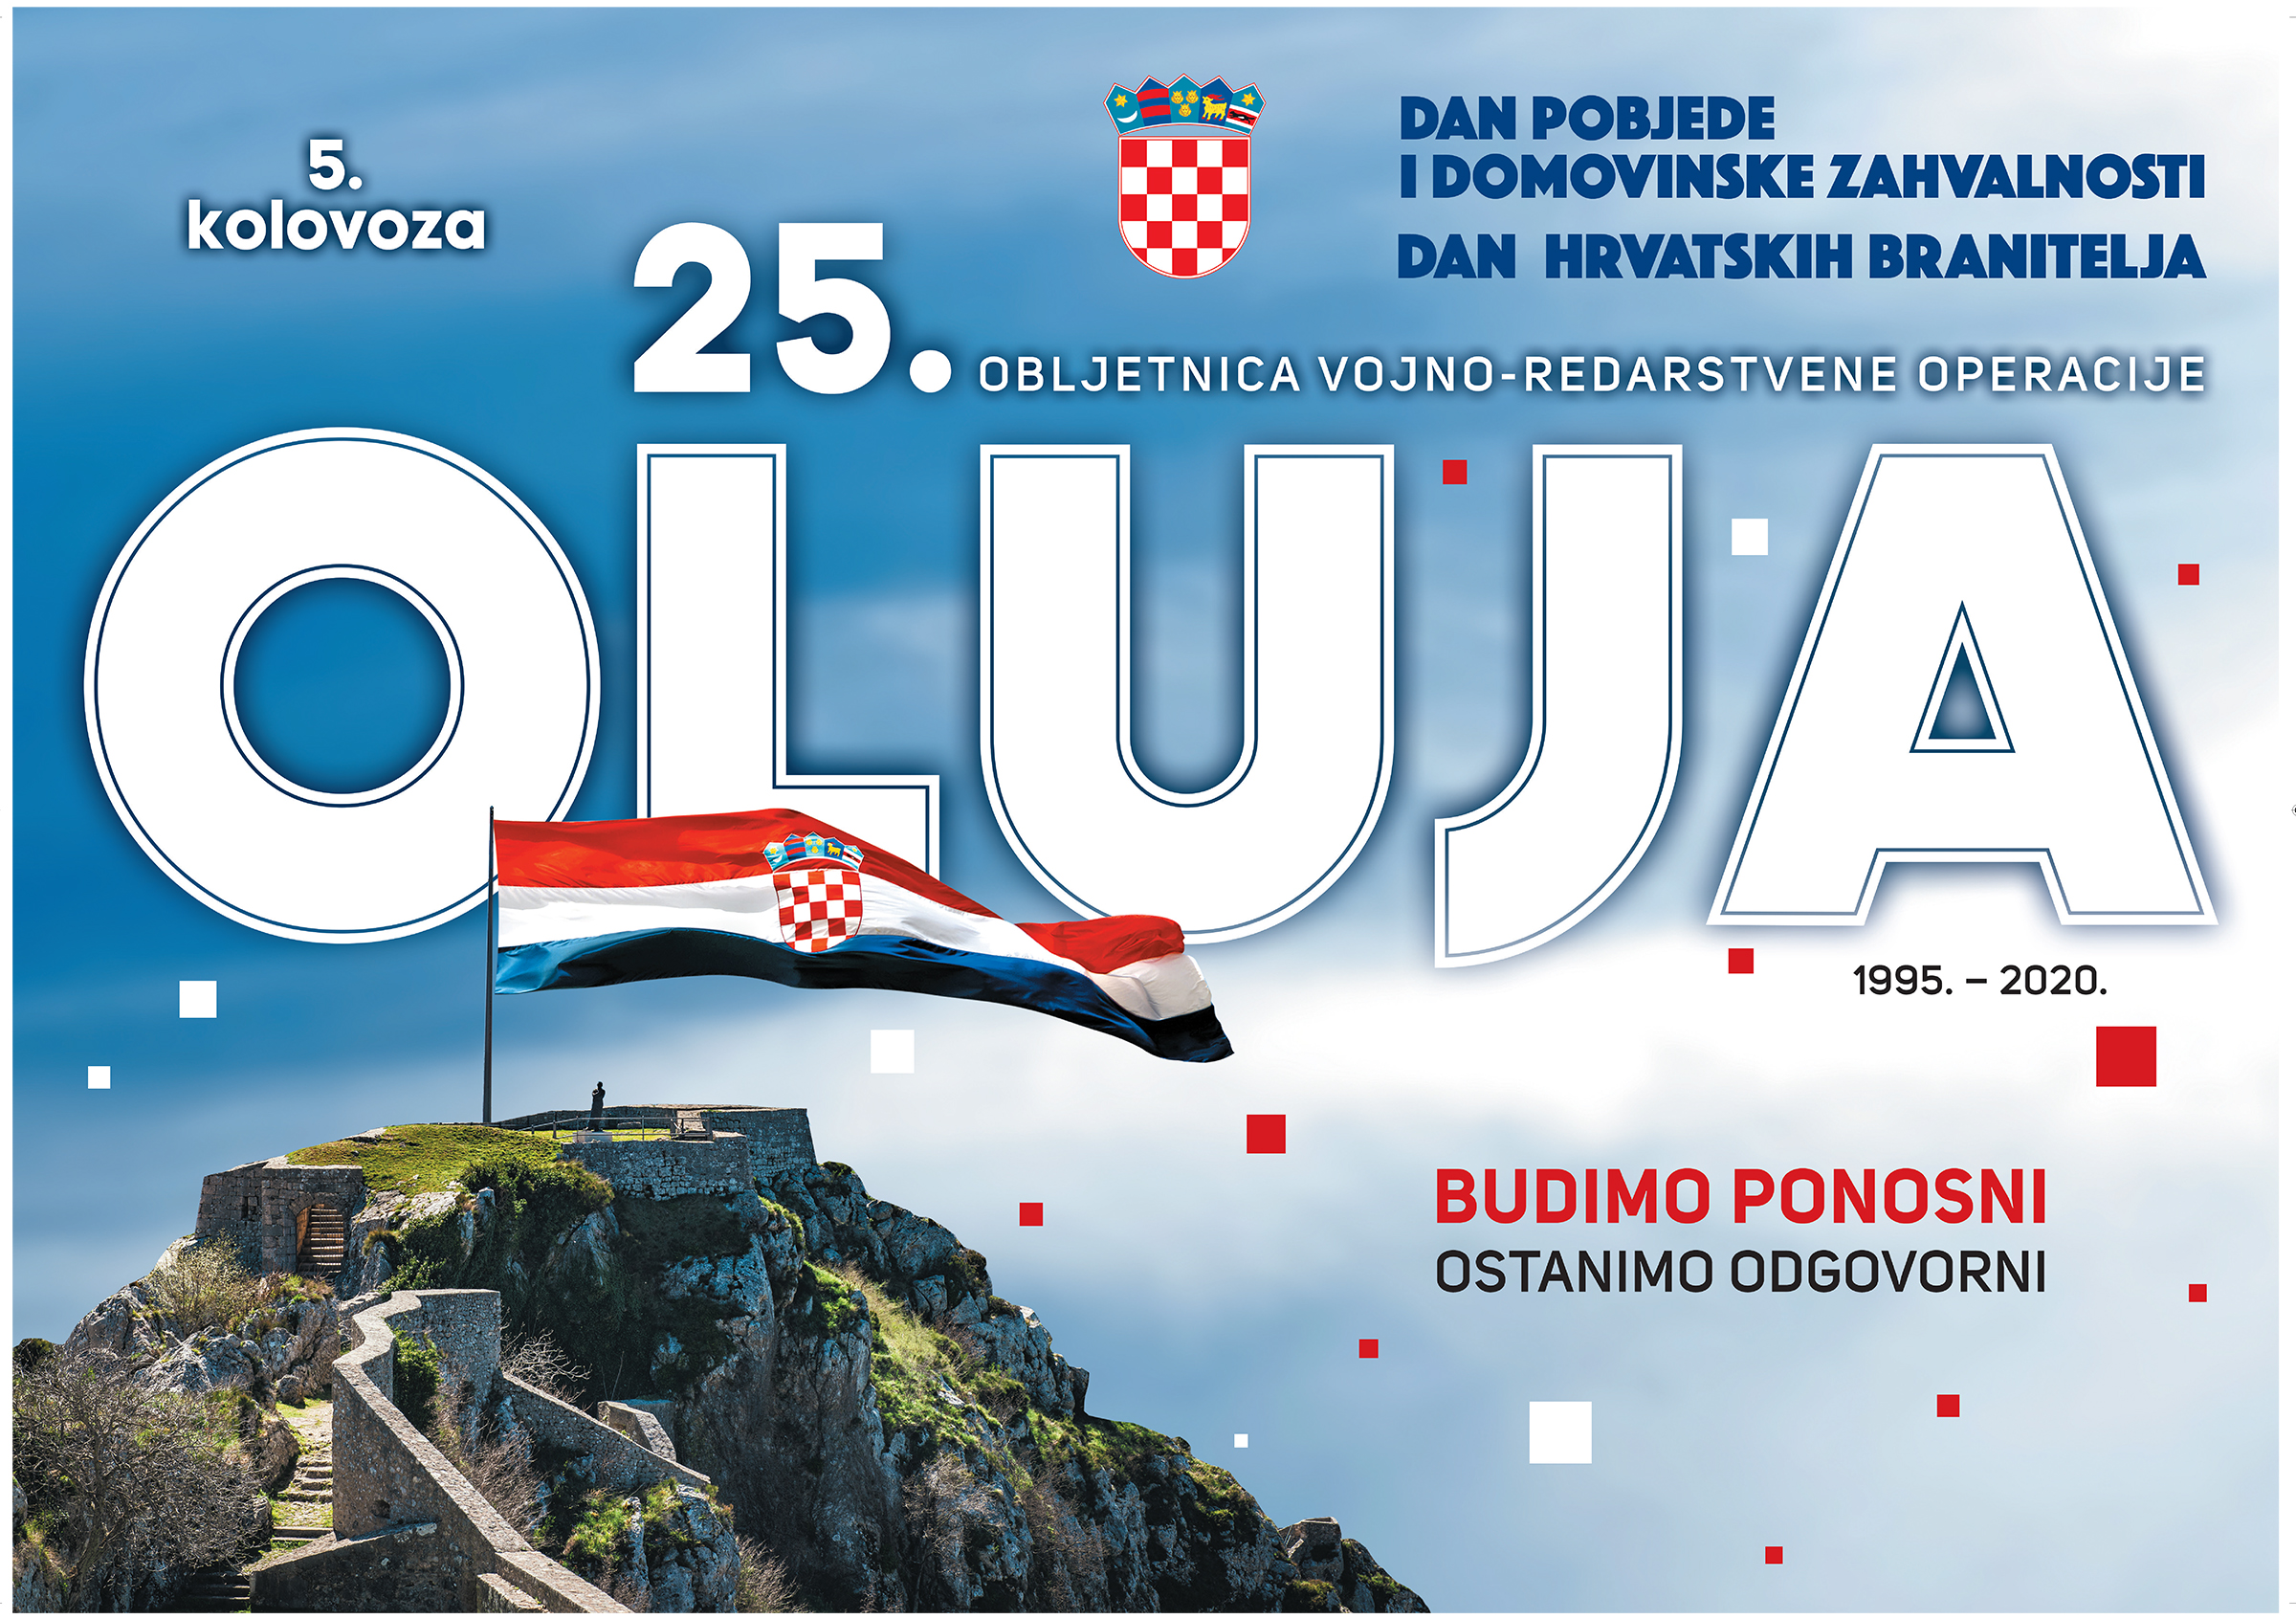 <!-- wp:paragraph --> <p>Čestitamo Dan Pobjede, domovinske zahvalnosti i dan hrvatskih branitelja</p> <!-- /wp:paragraph -->